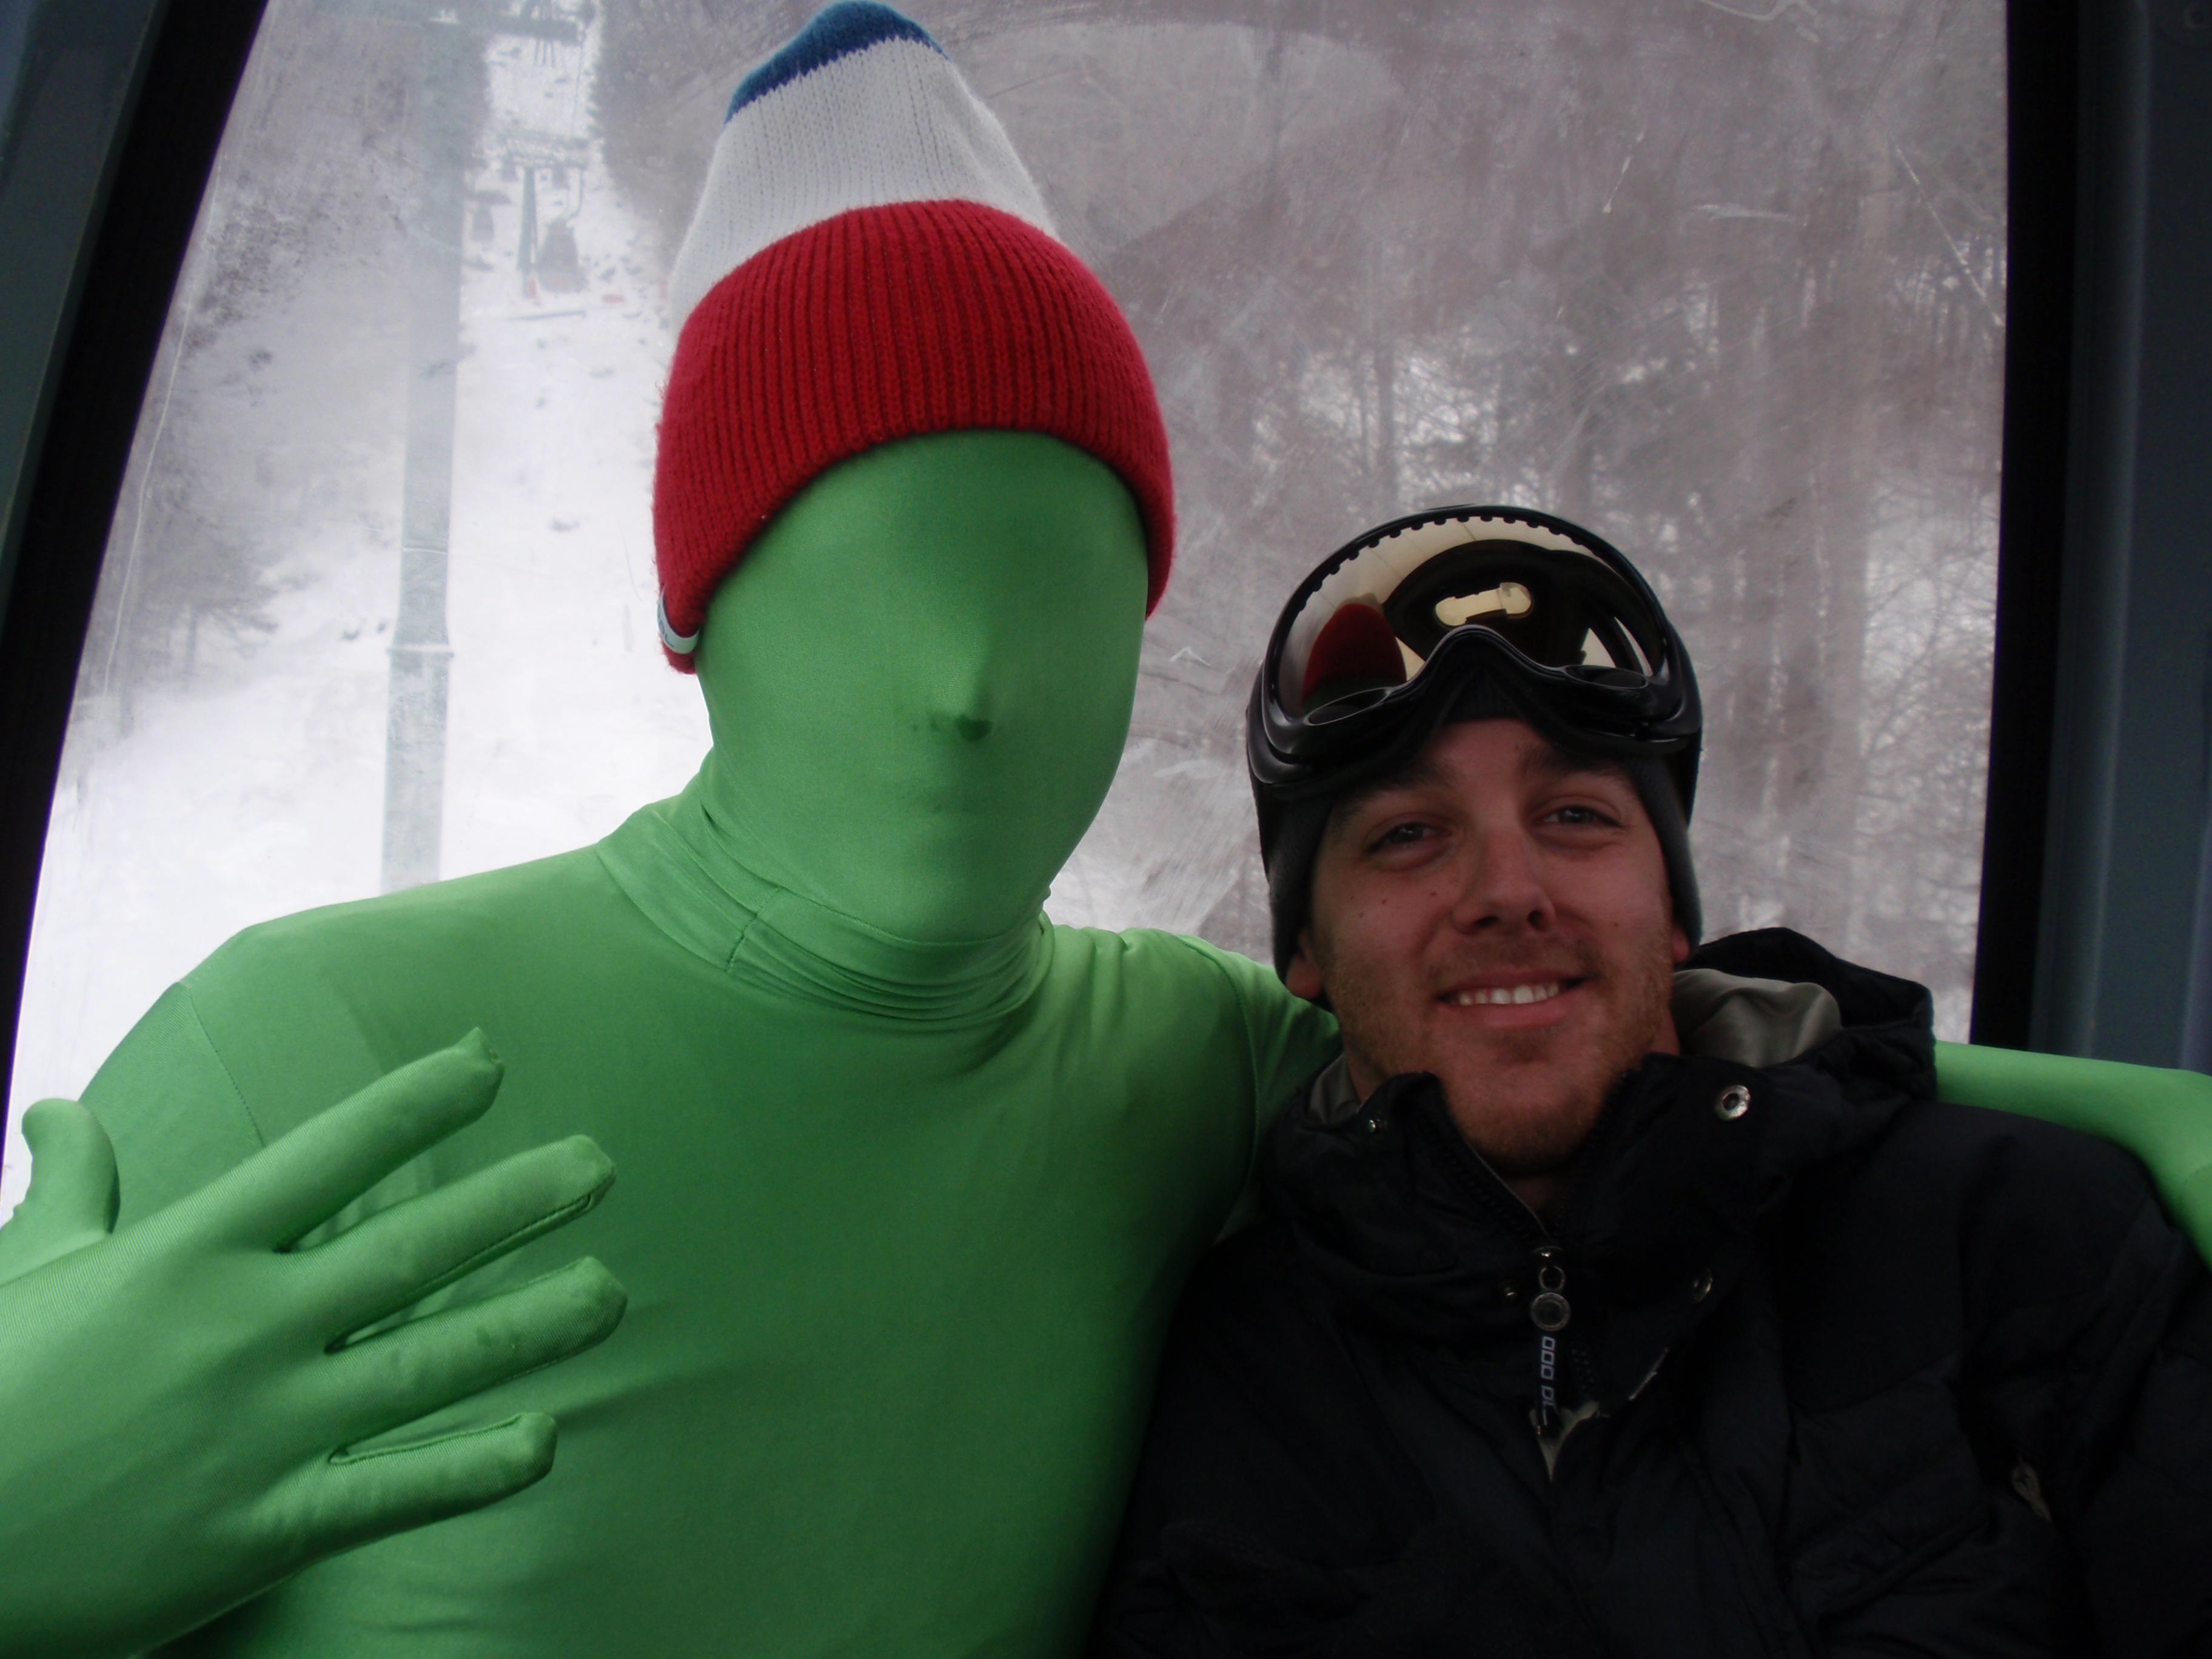 Green Man on Gondola